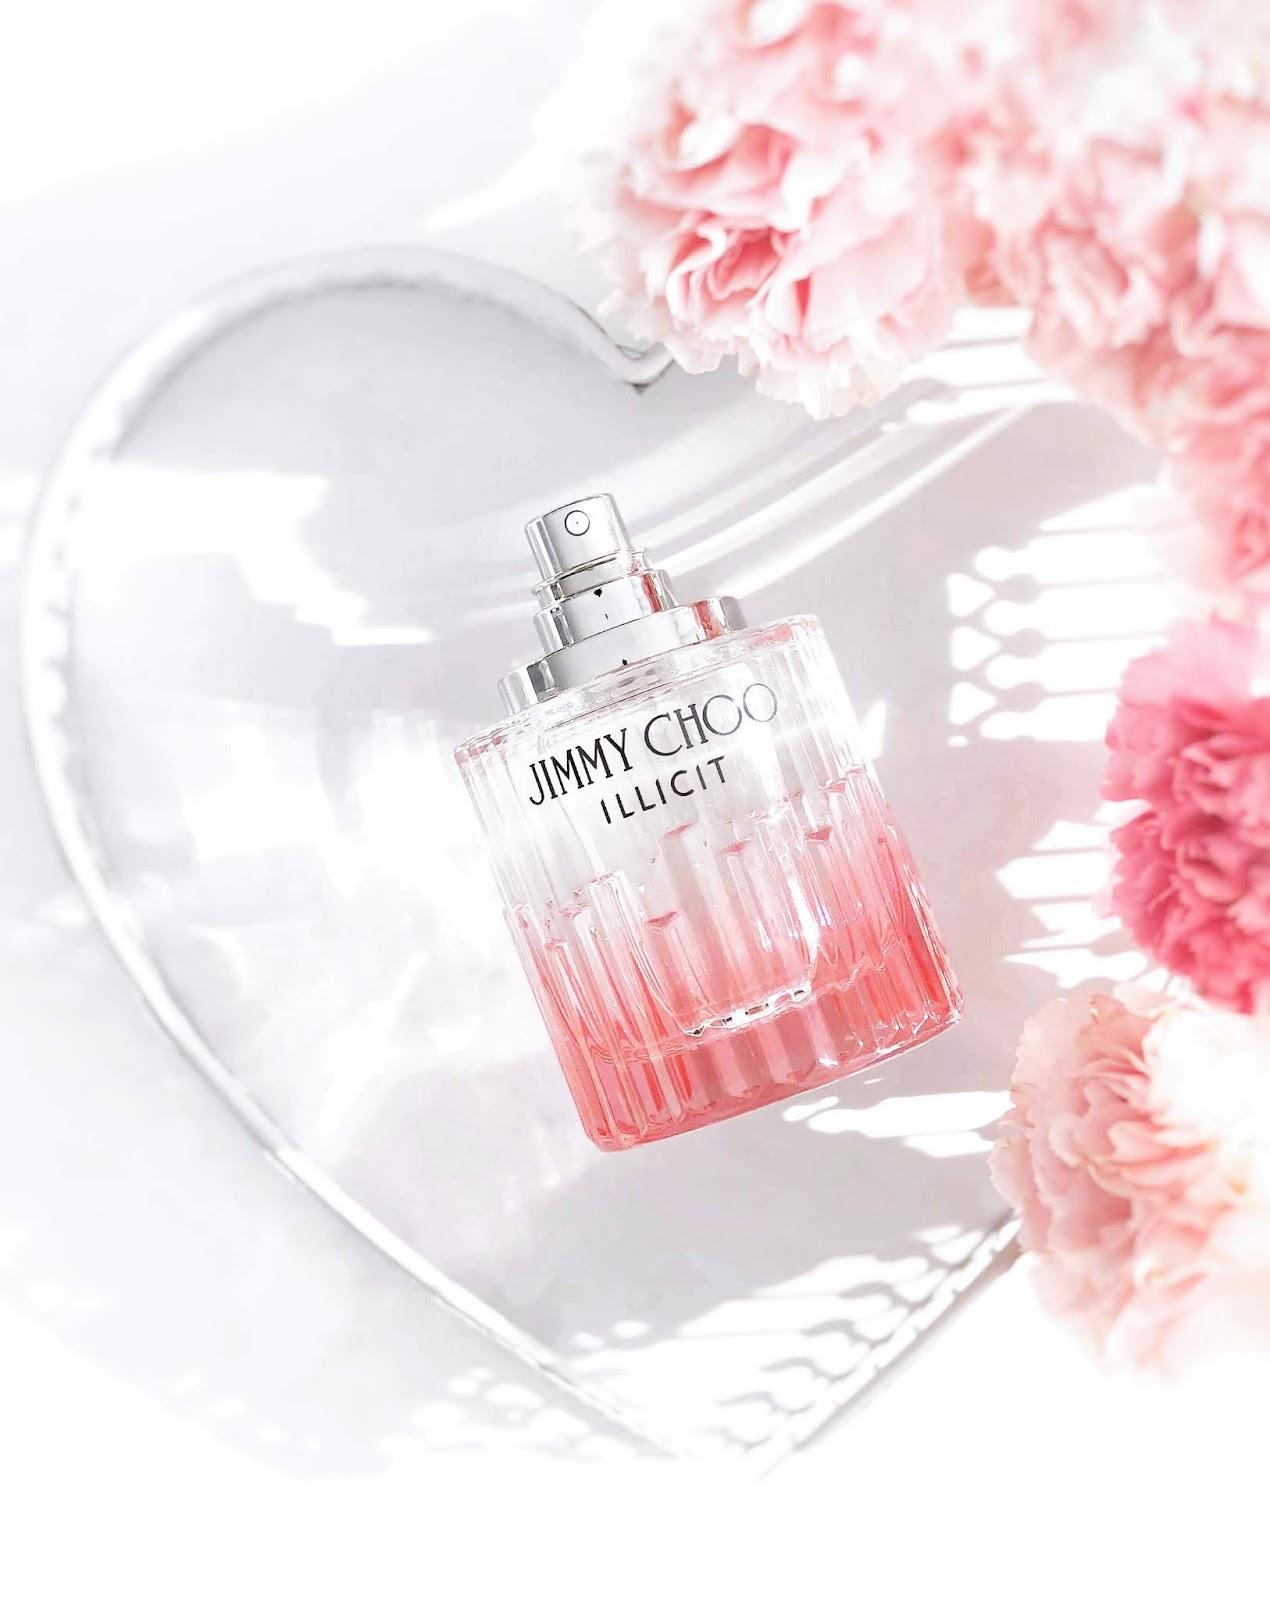 Jimmy-Choo-Illicit-perfumy-na-wiosne